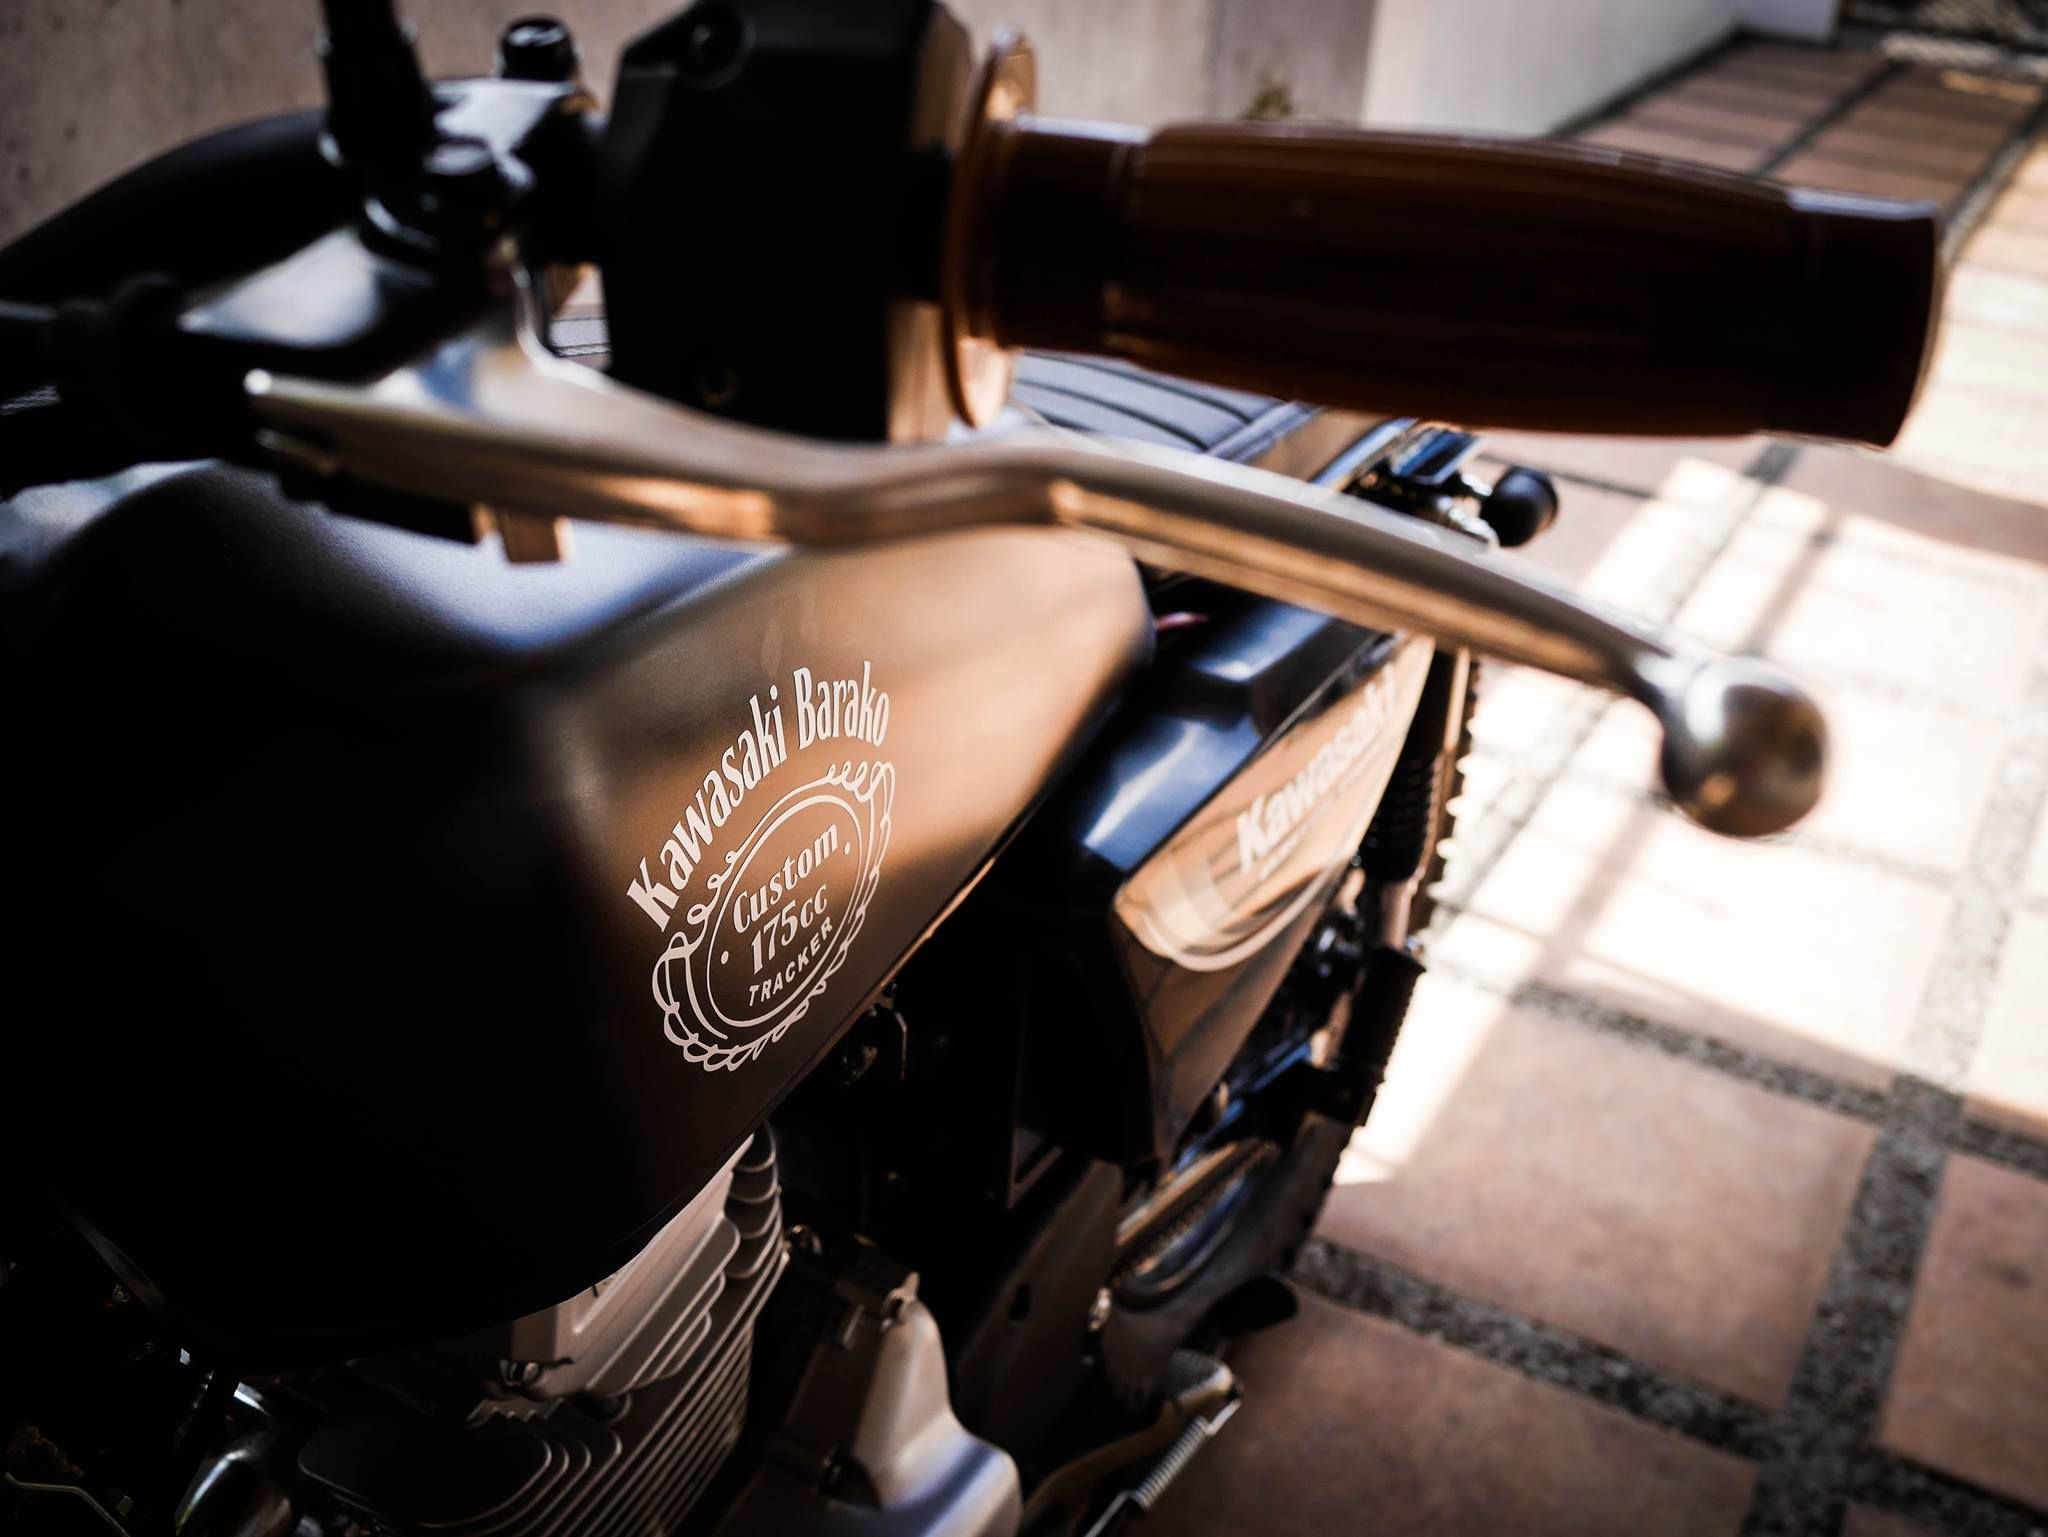 Bike Feature: Custom Kawasaki Barako II 175cc by Bim Pasia